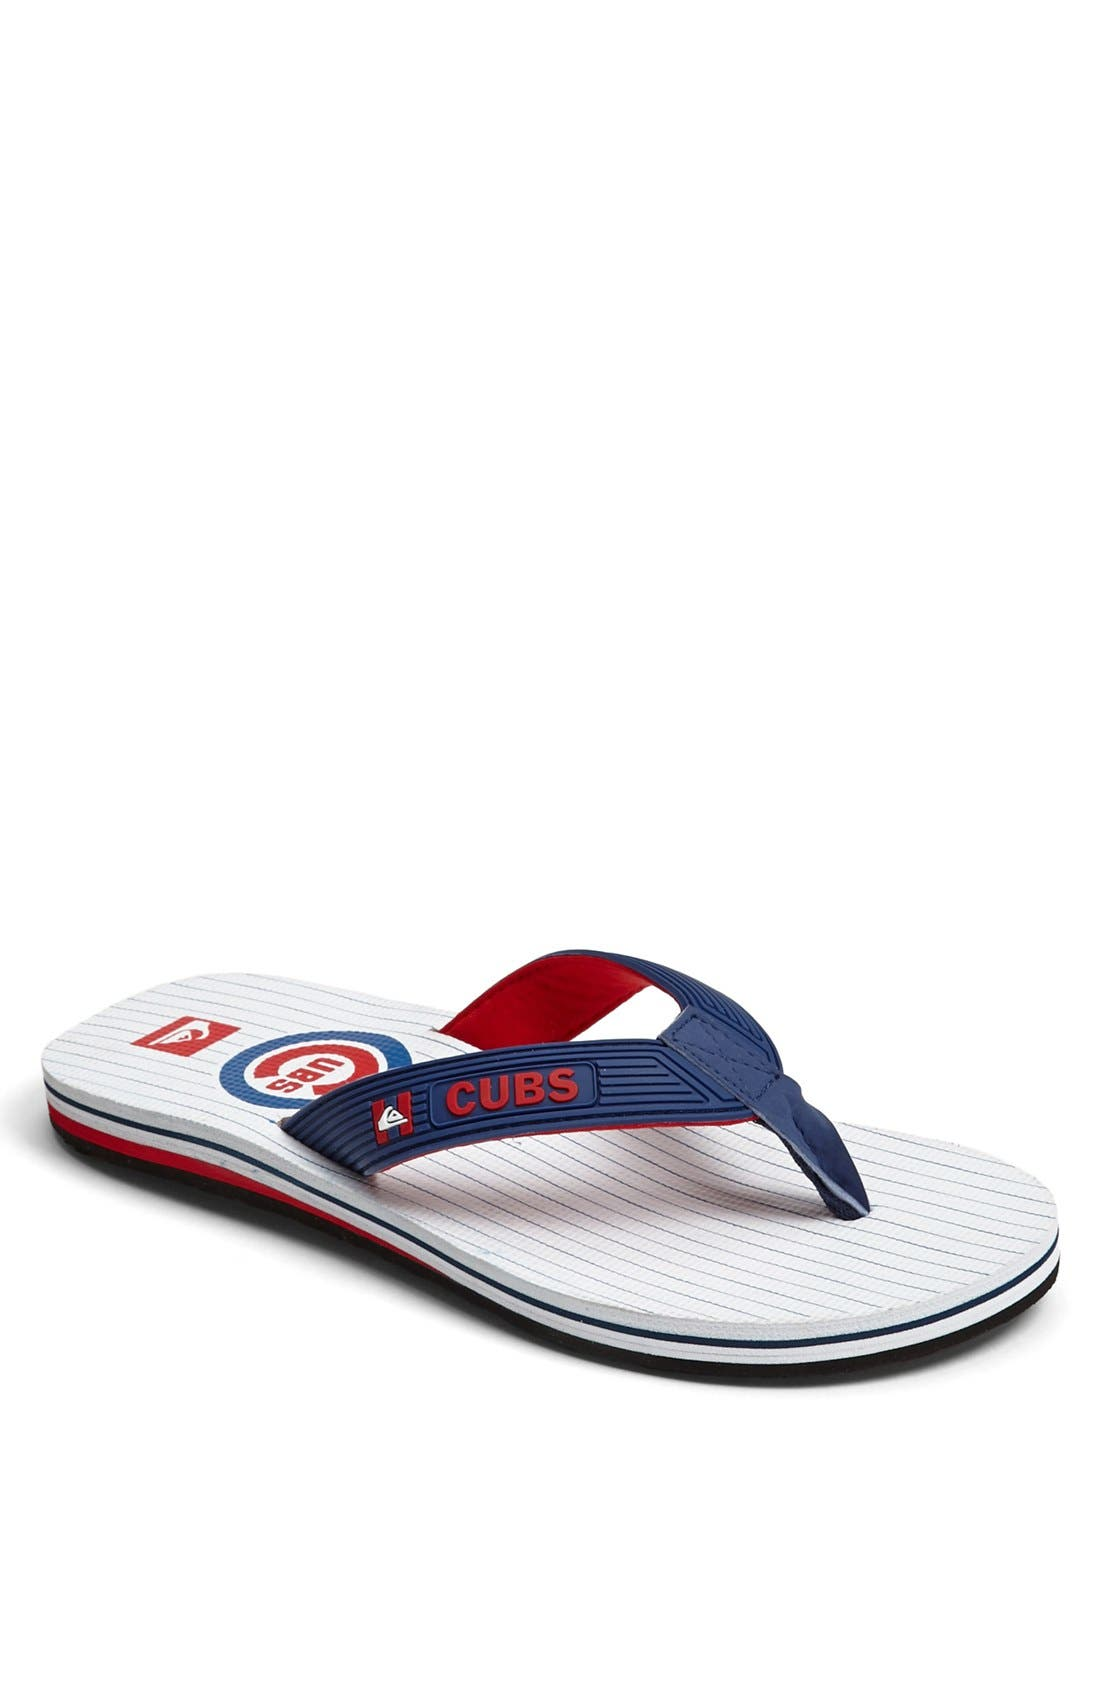 Alternate Image 1 Selected - Quiksilver 'MLB' Flip Flops (Men)